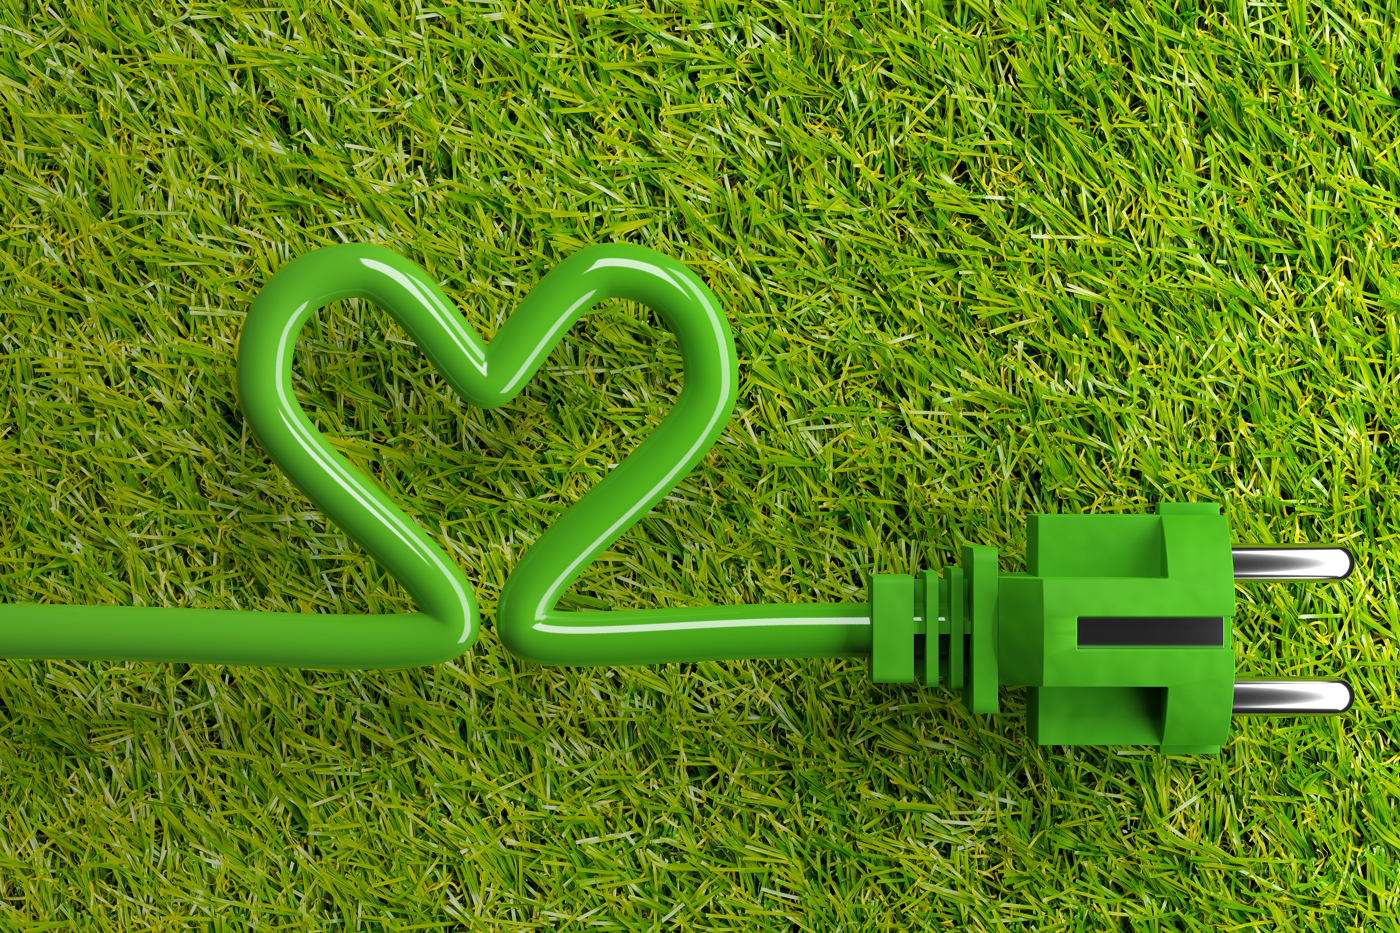 Alternative Energy stocks, Electric vehicle stocks, Green Technology stocks, Greentech